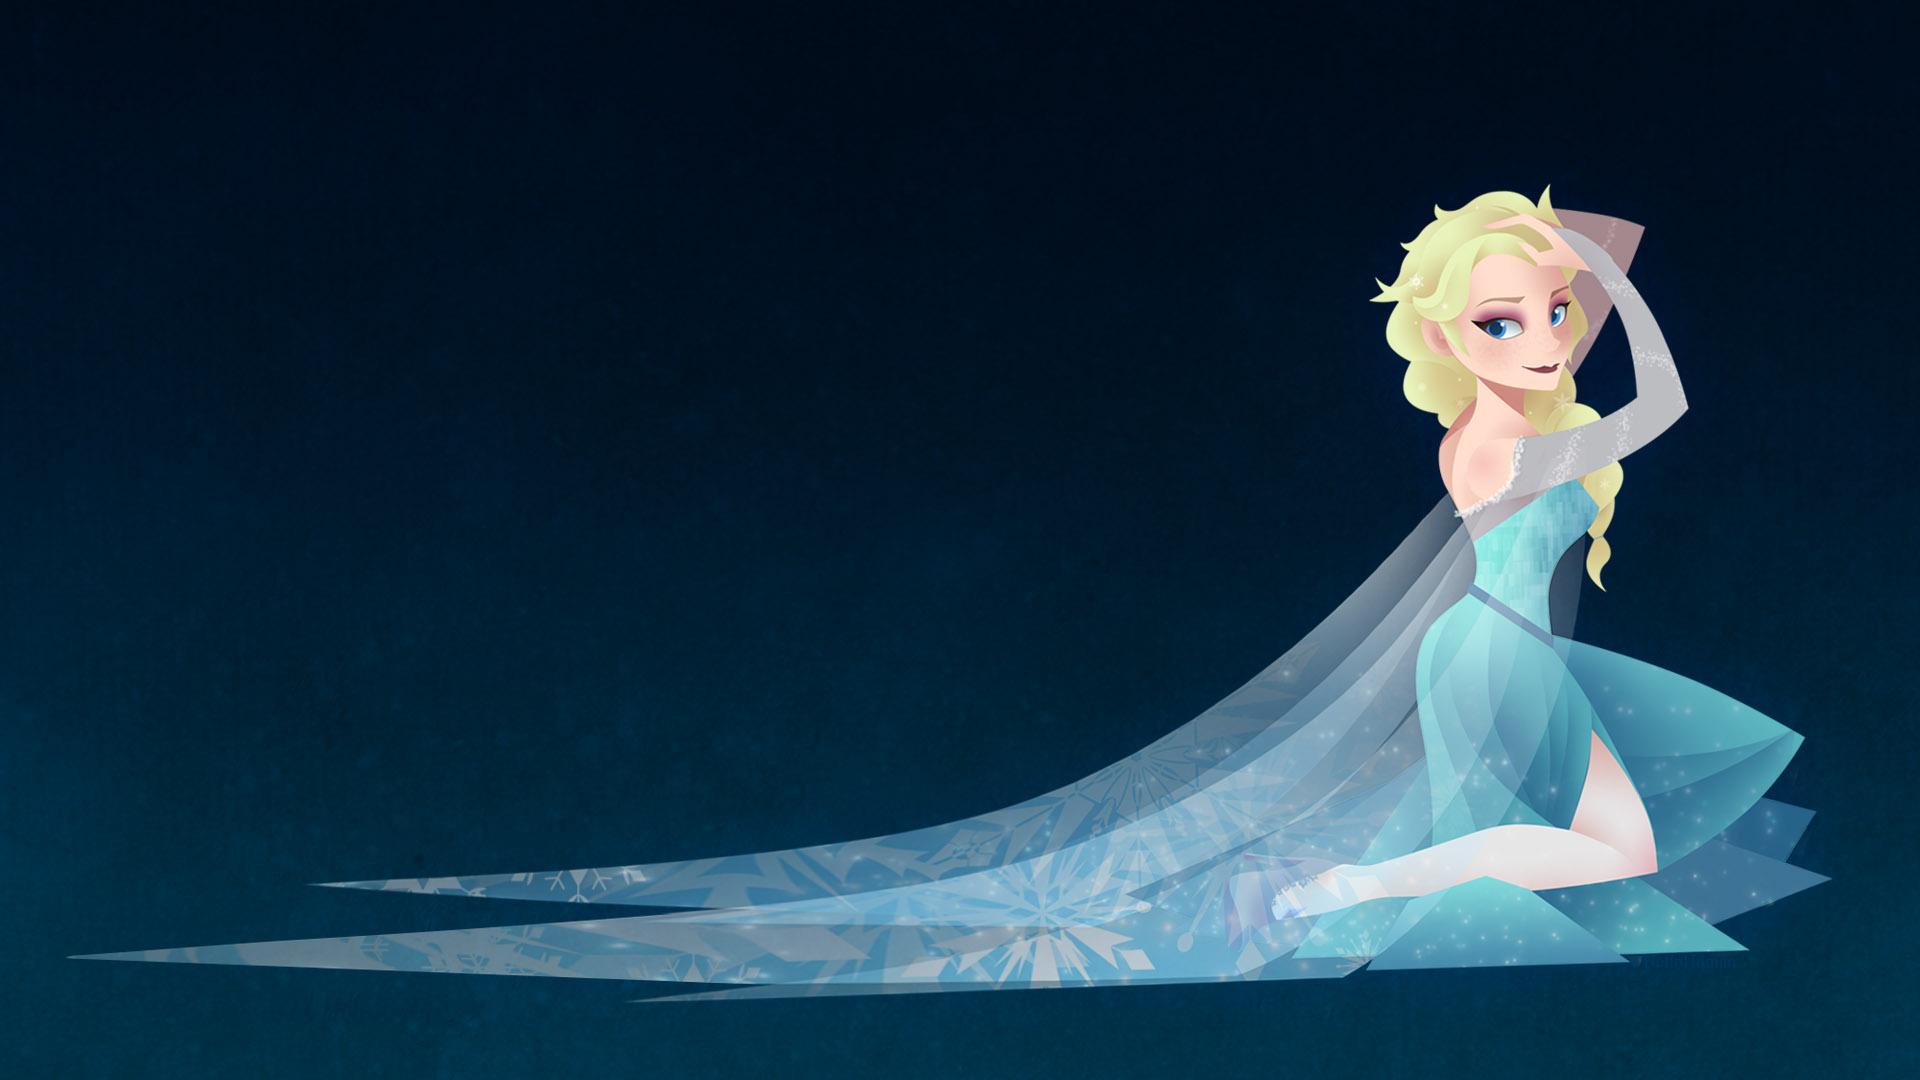 Elsa Wallpaper By NalinSketch